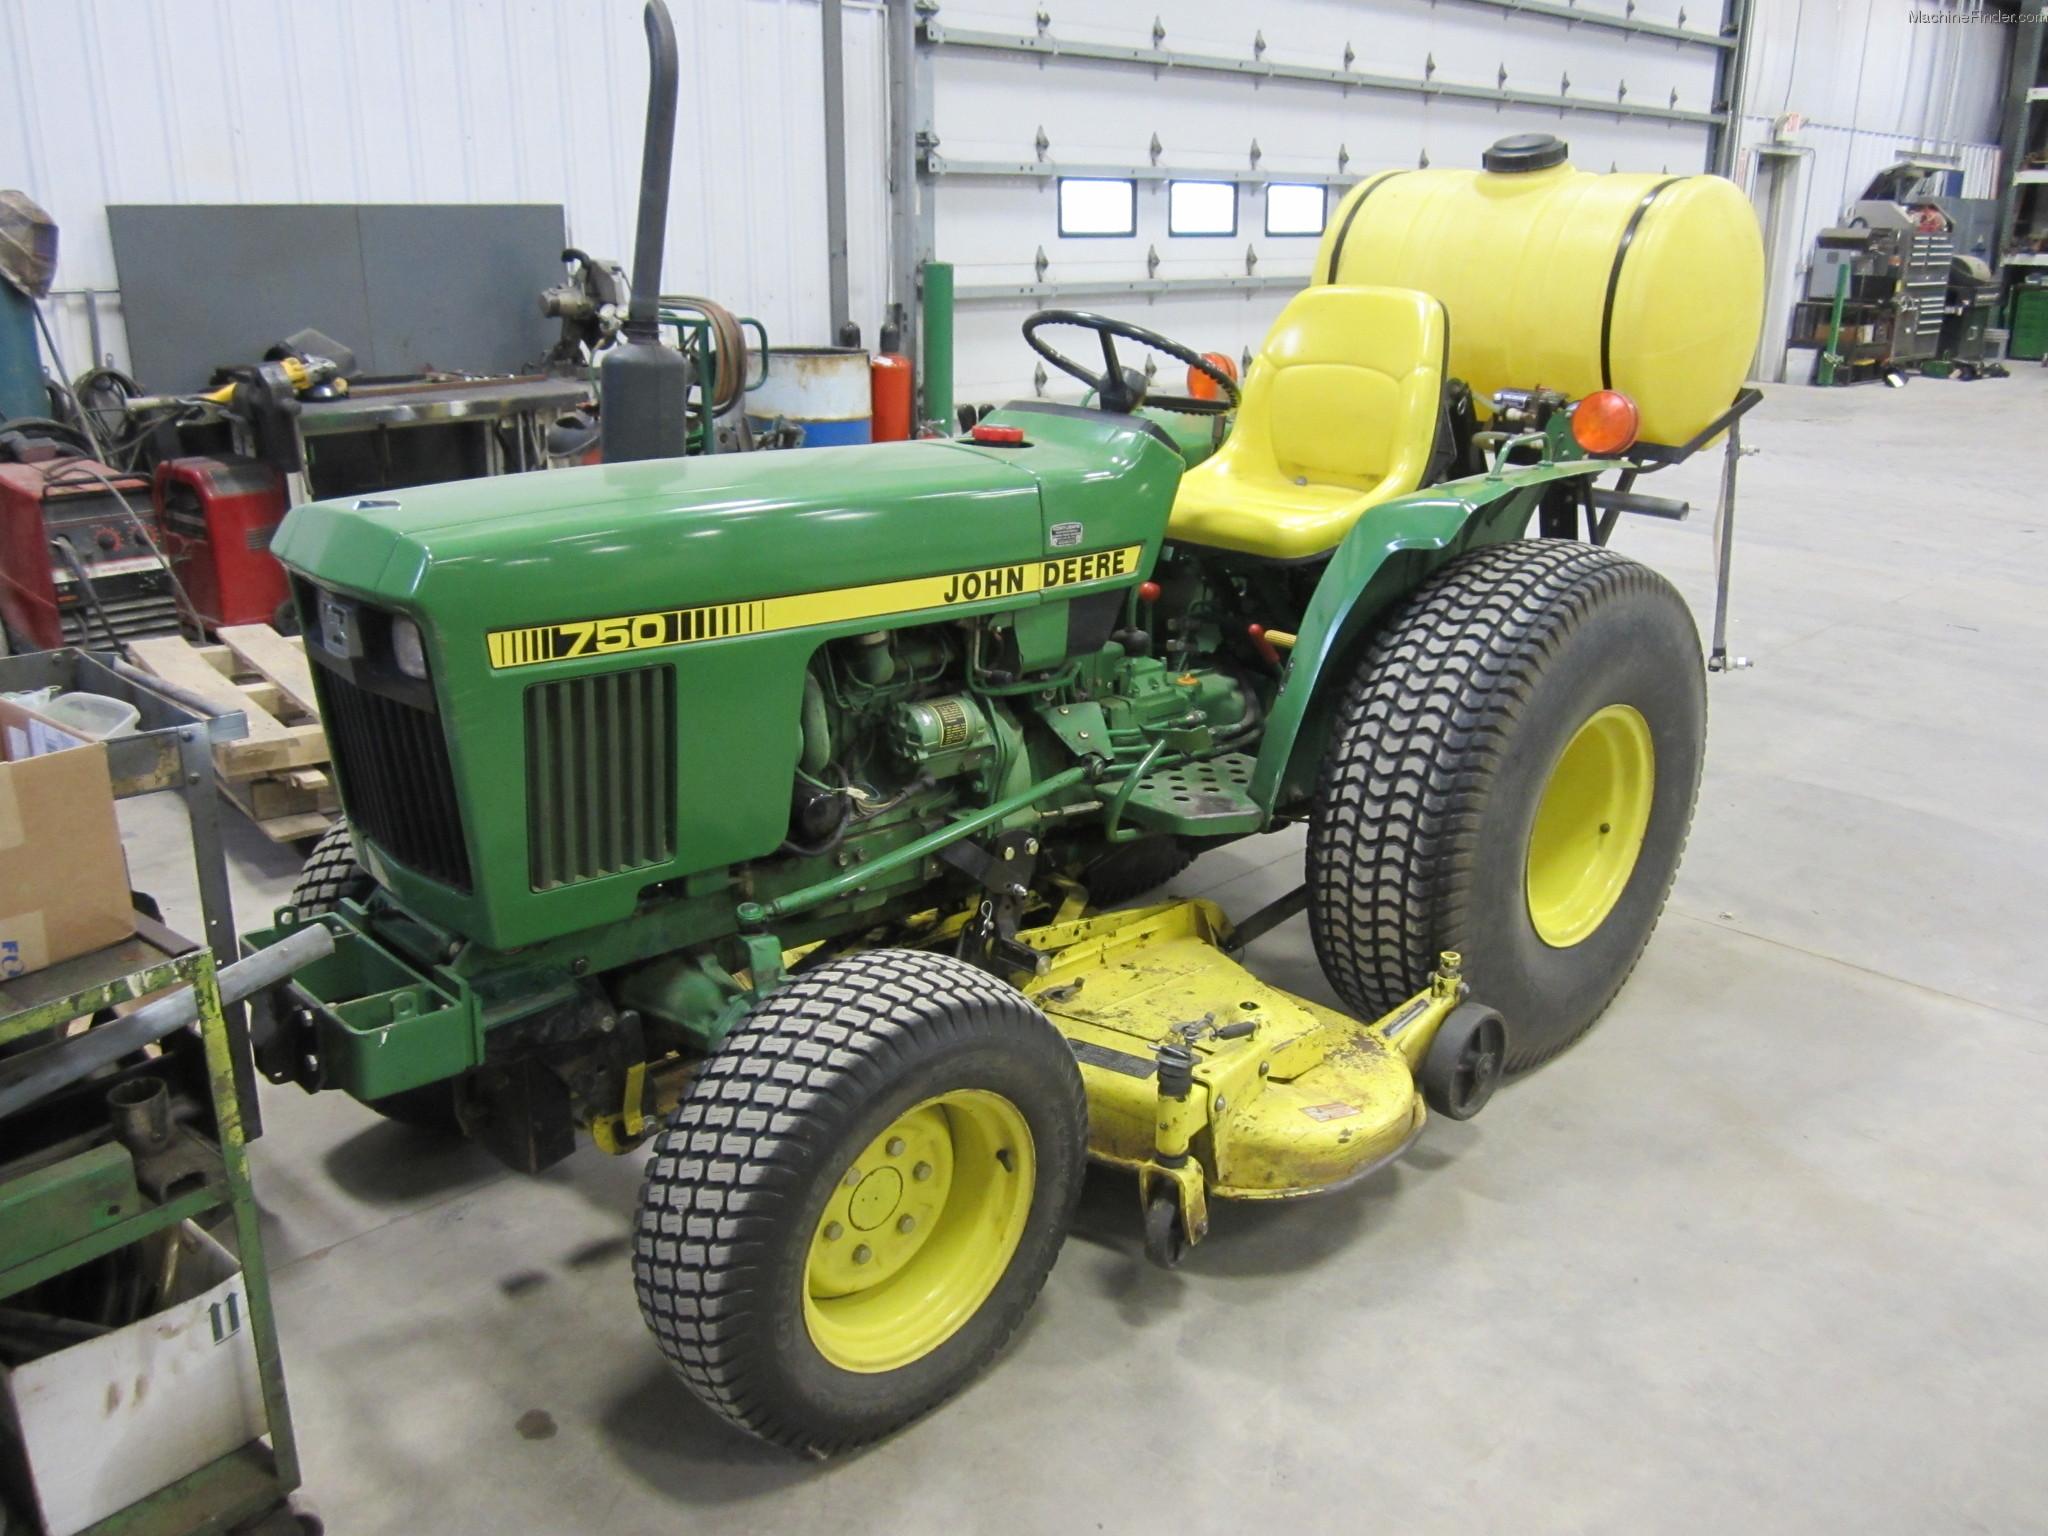 1985 John Deere 750 Tractors - Compact (1-40hp.) - John ...